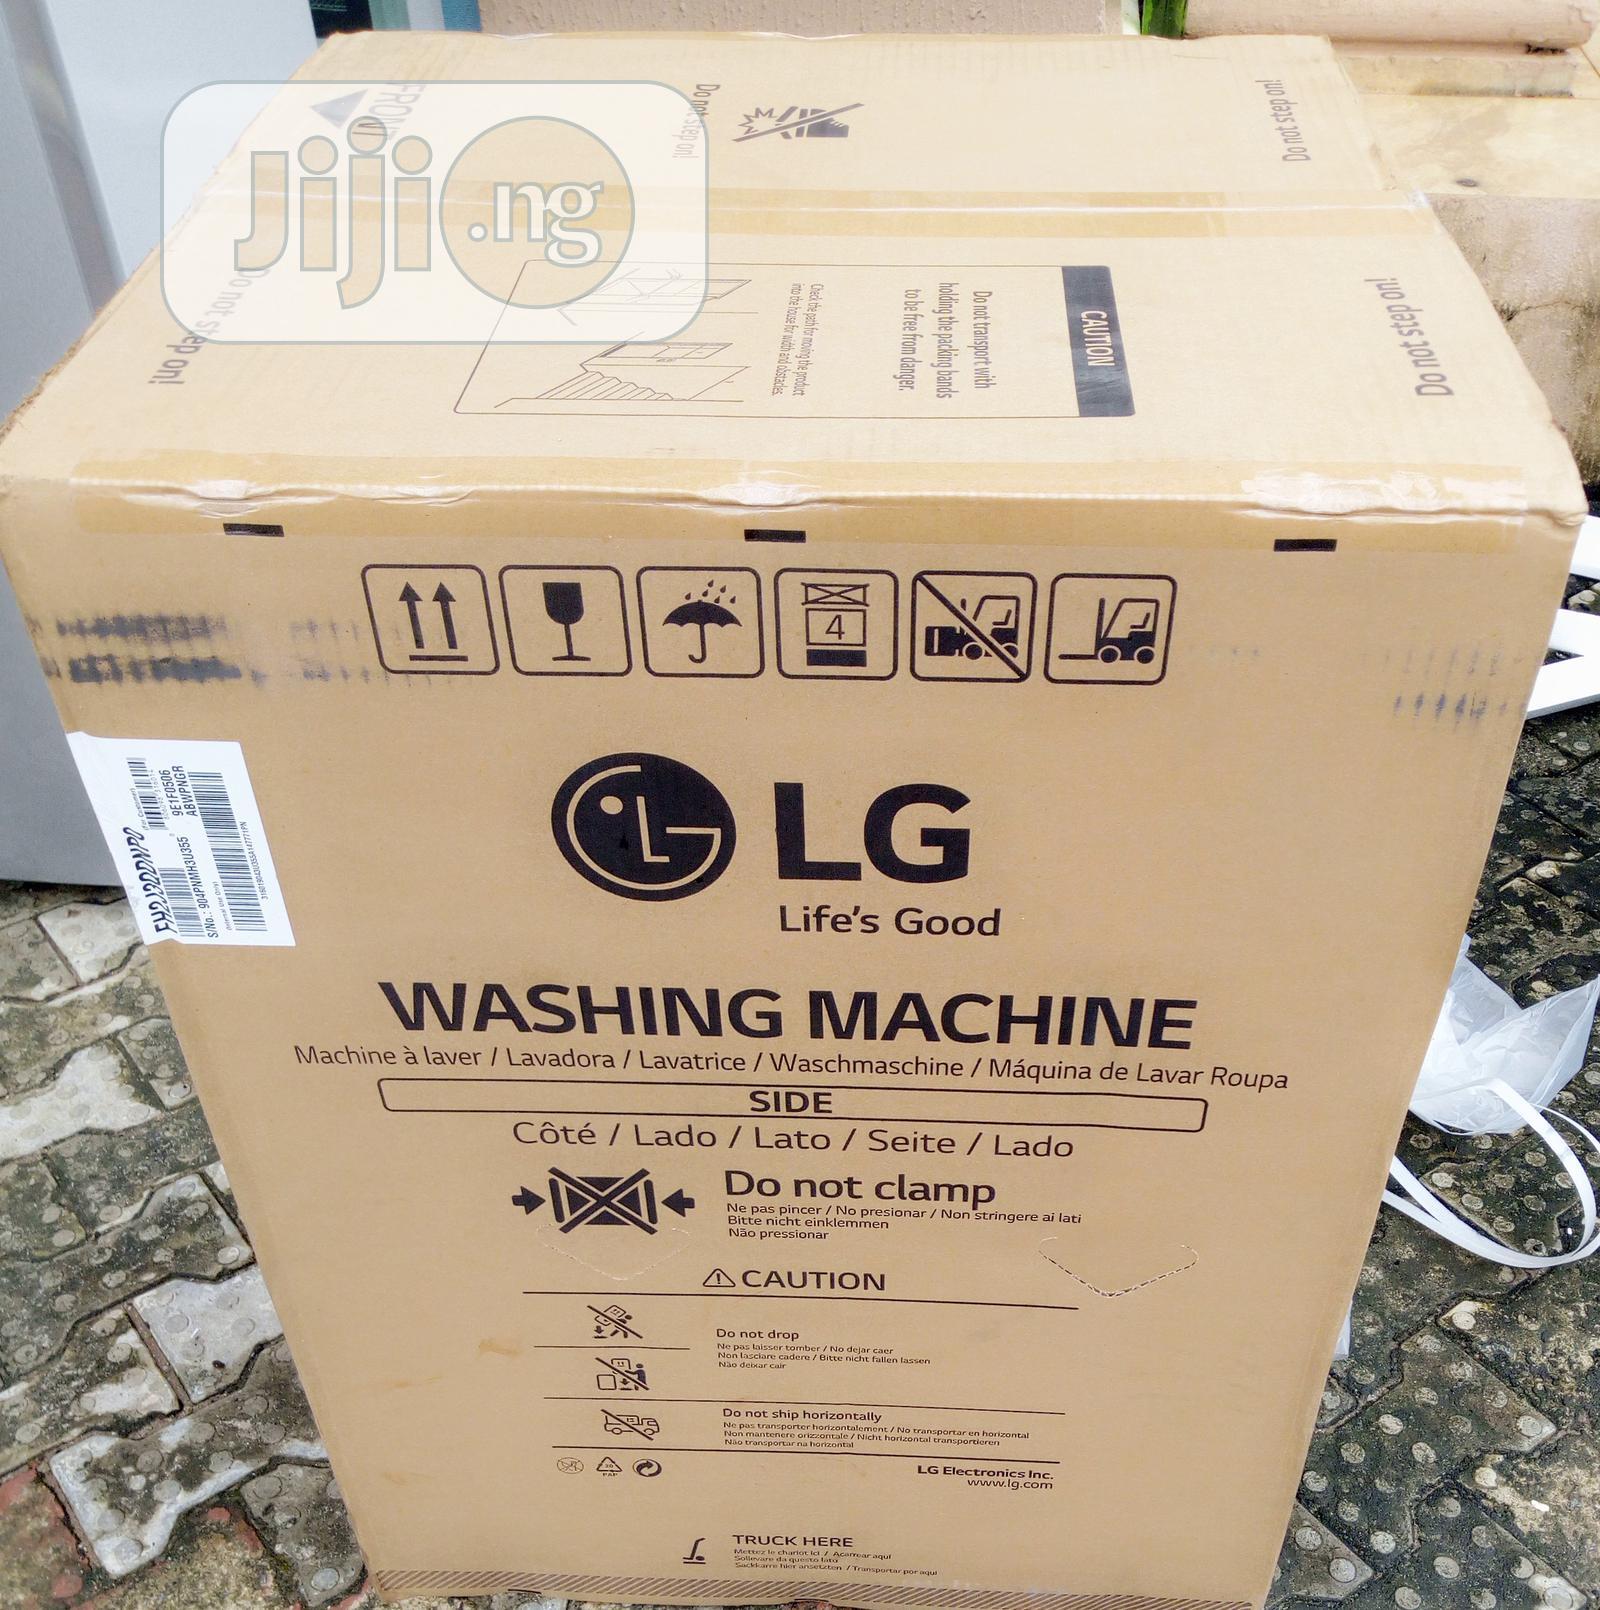 LG Washing Machine Front Loader - FH2J3QDNPO   Home Appliances for sale in Benin City, Edo State, Nigeria